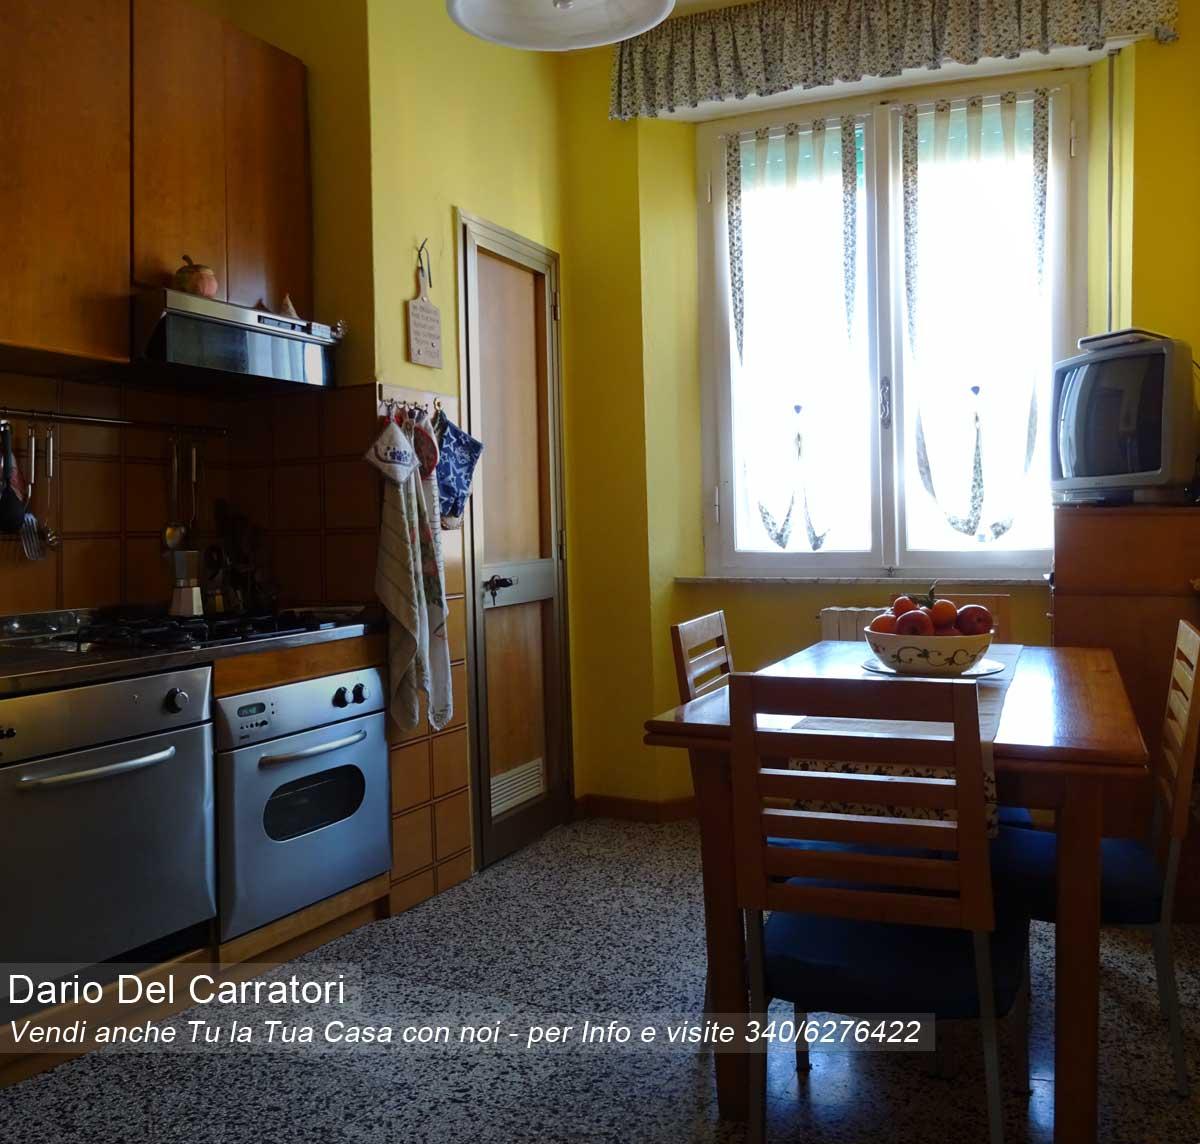 Appartamento in vendita a cascina centro con garage e balcone for Casa in vendita con garage appartamento